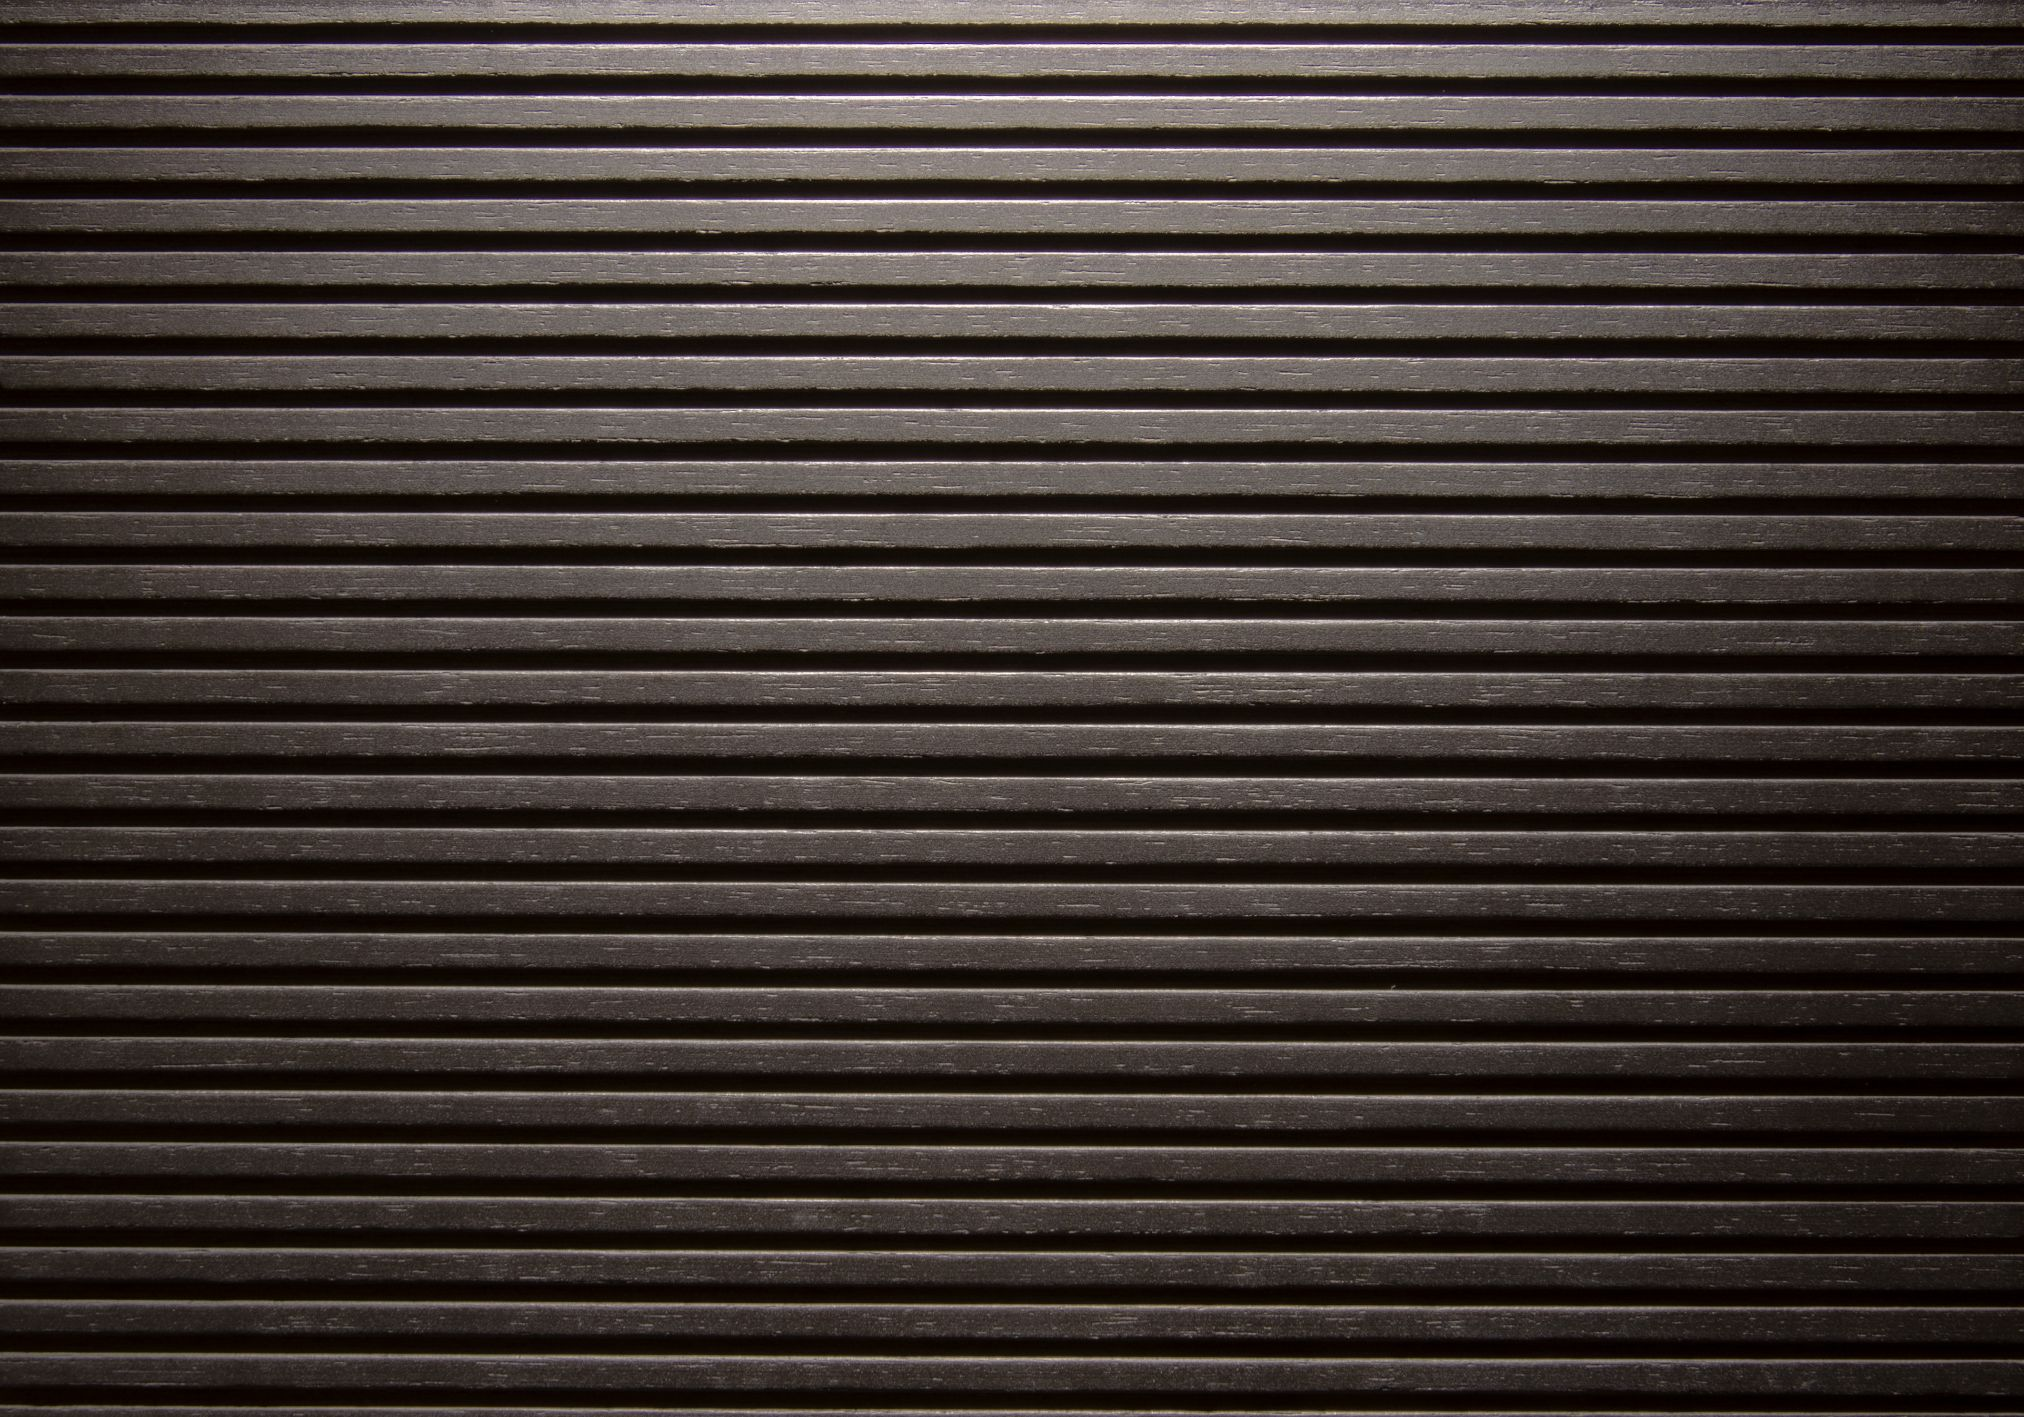 2608 MATCH - Black - Alpi veneer